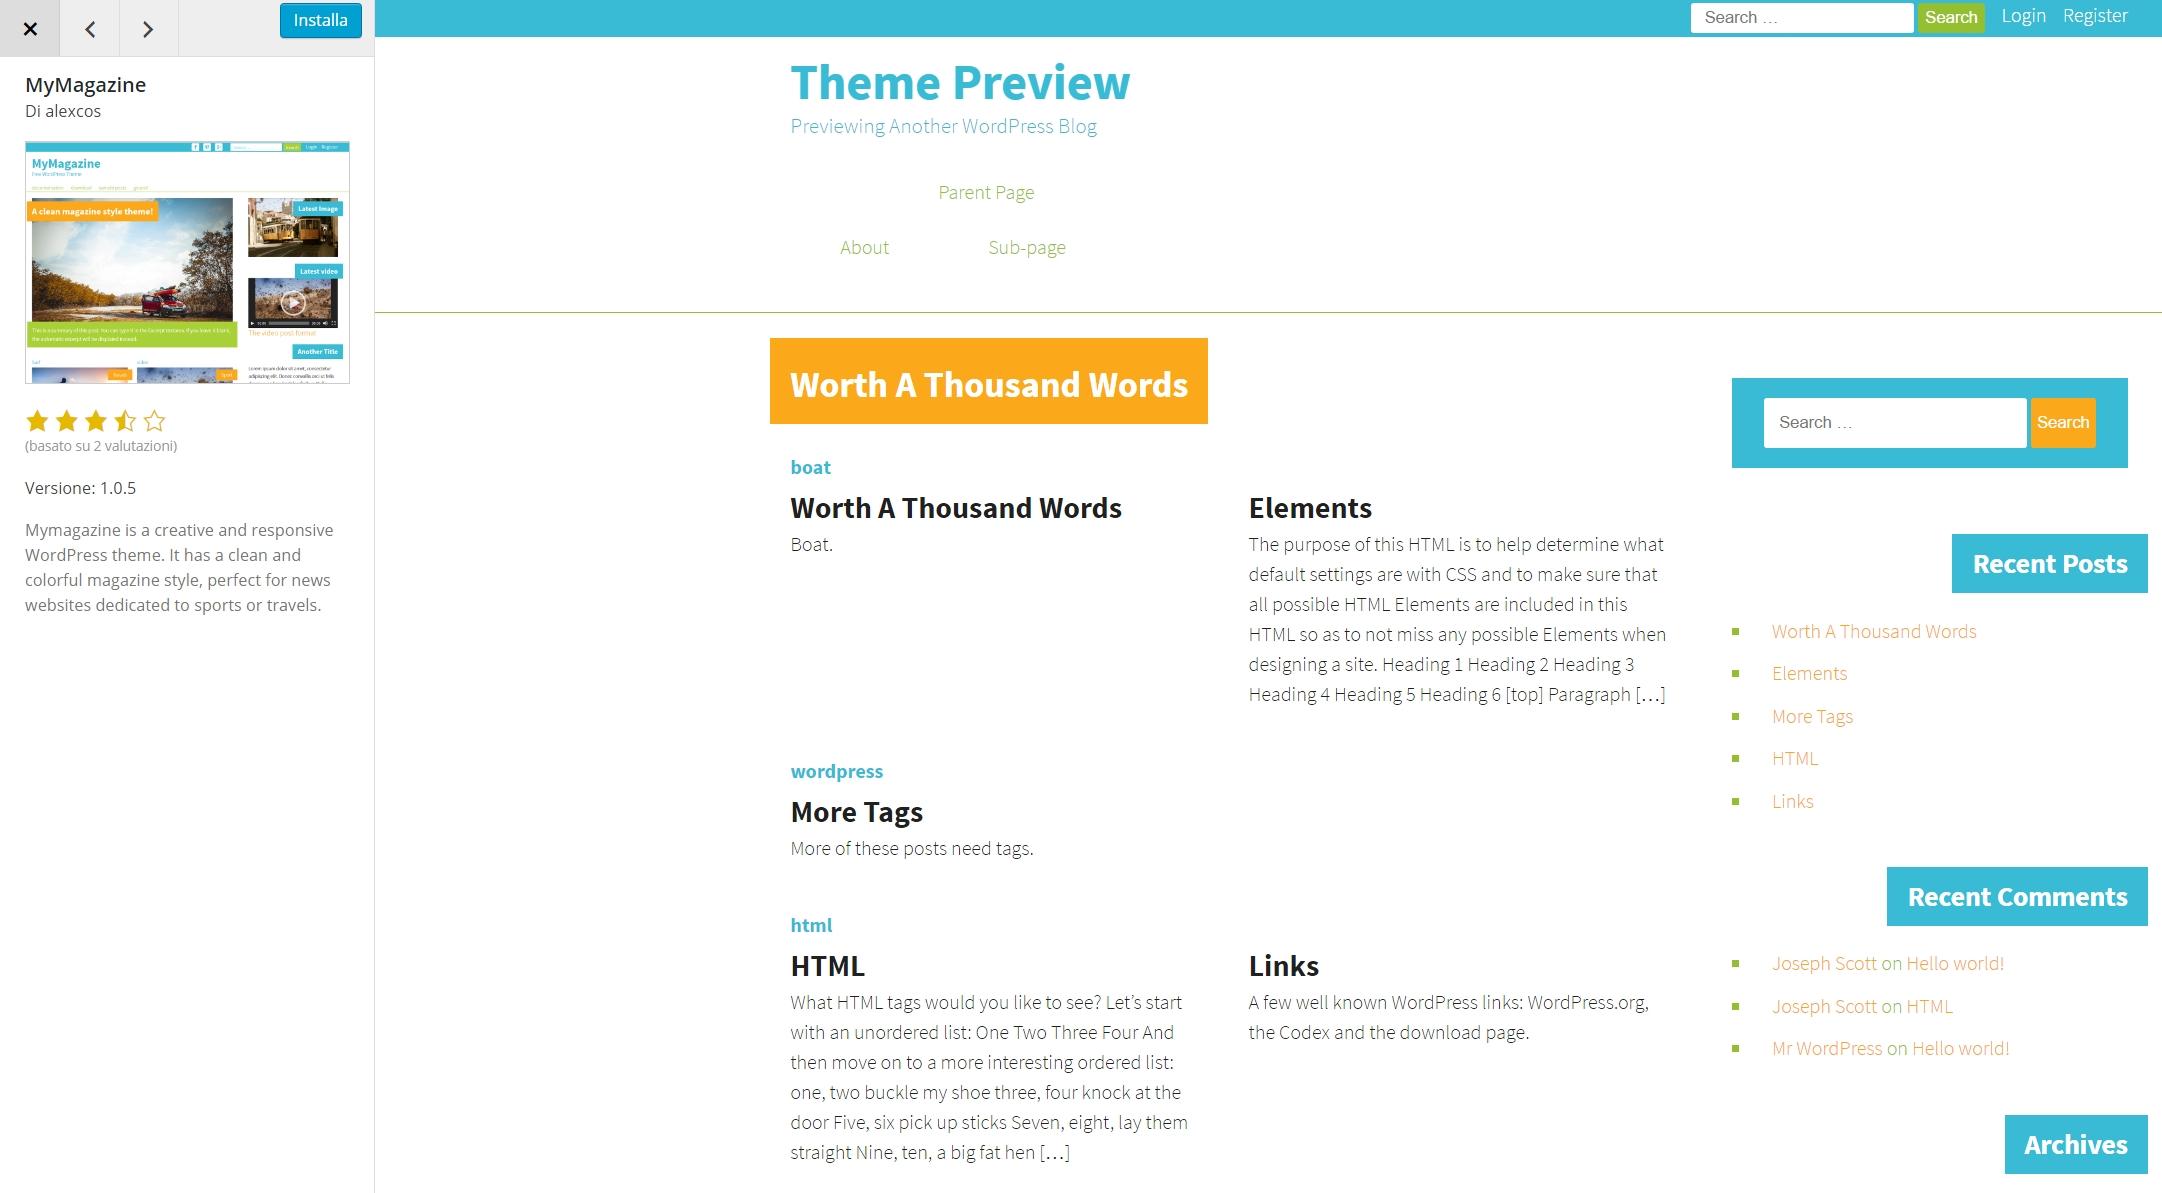 WordPress, anteprima di un tema